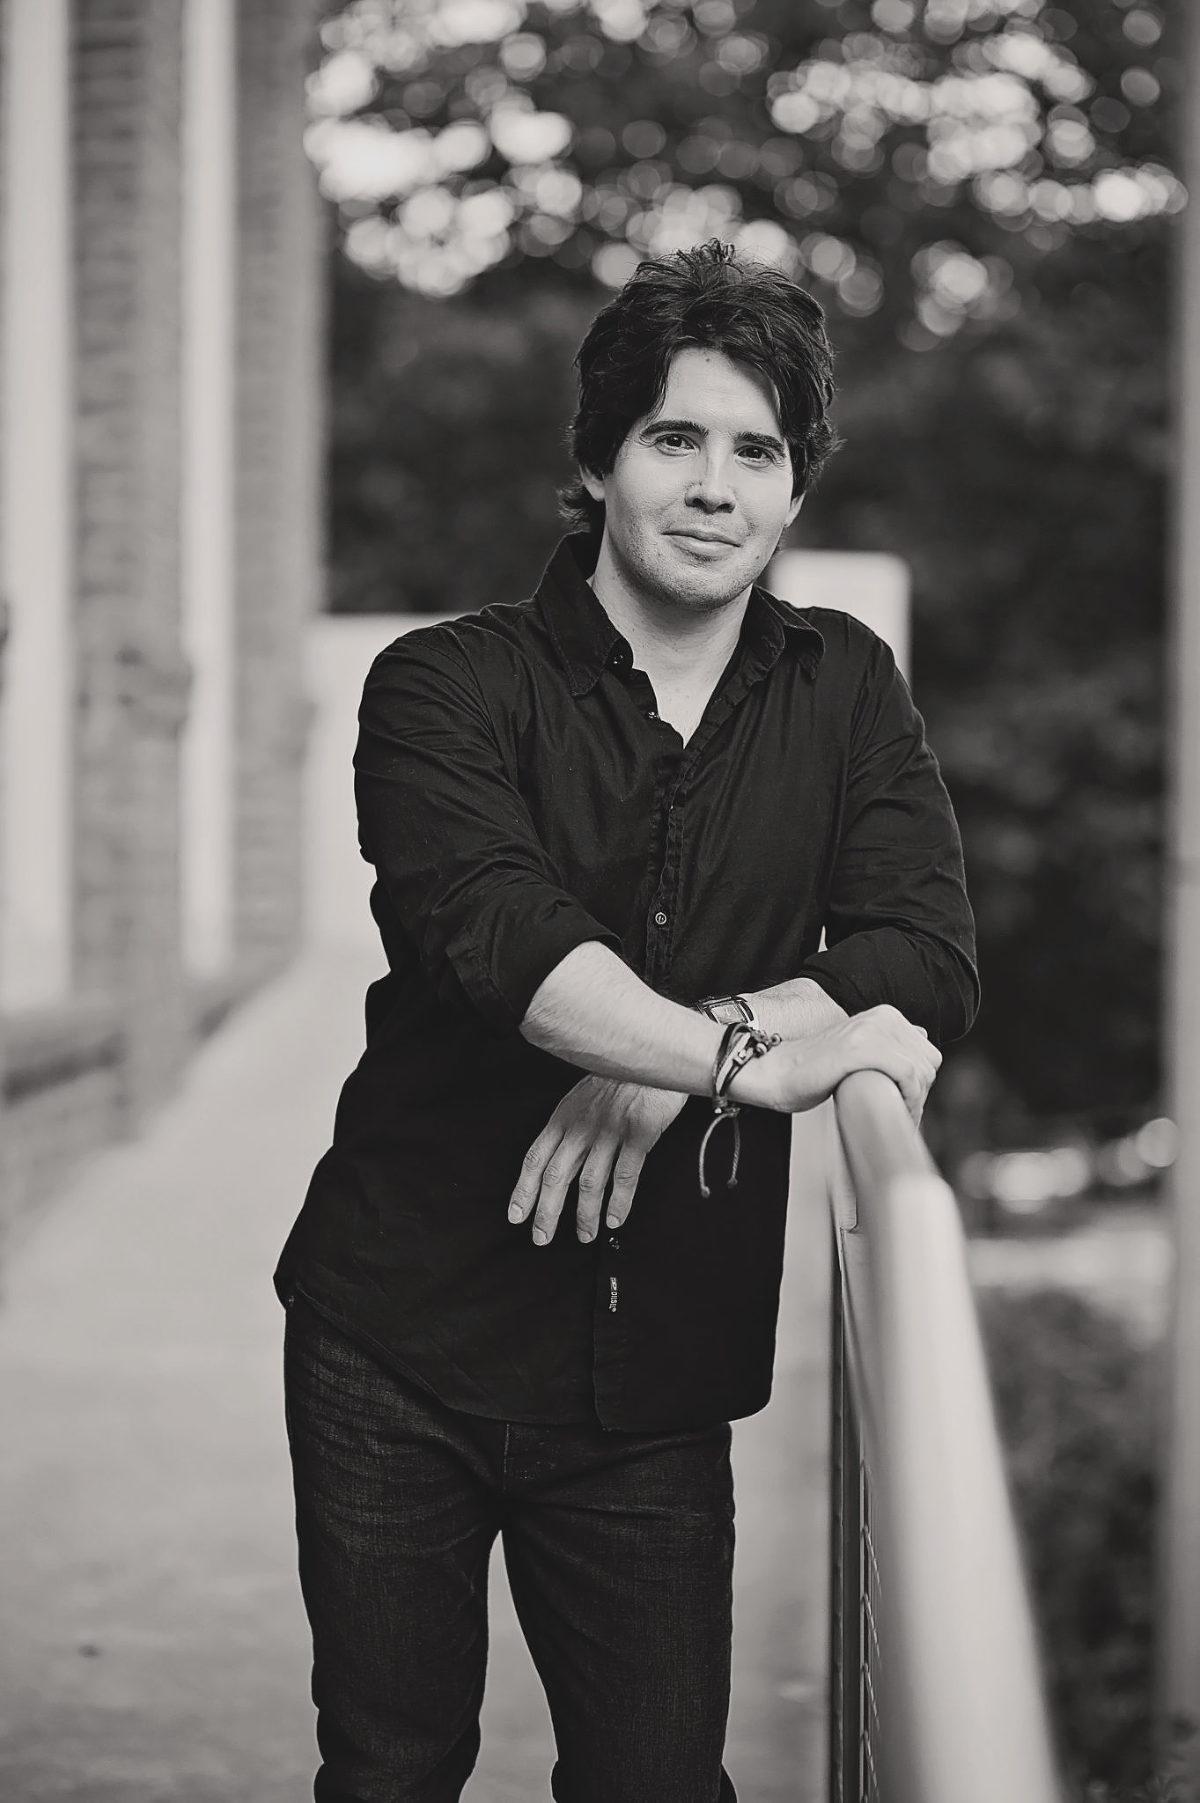 man wearing a black shirt standing by a porch rail